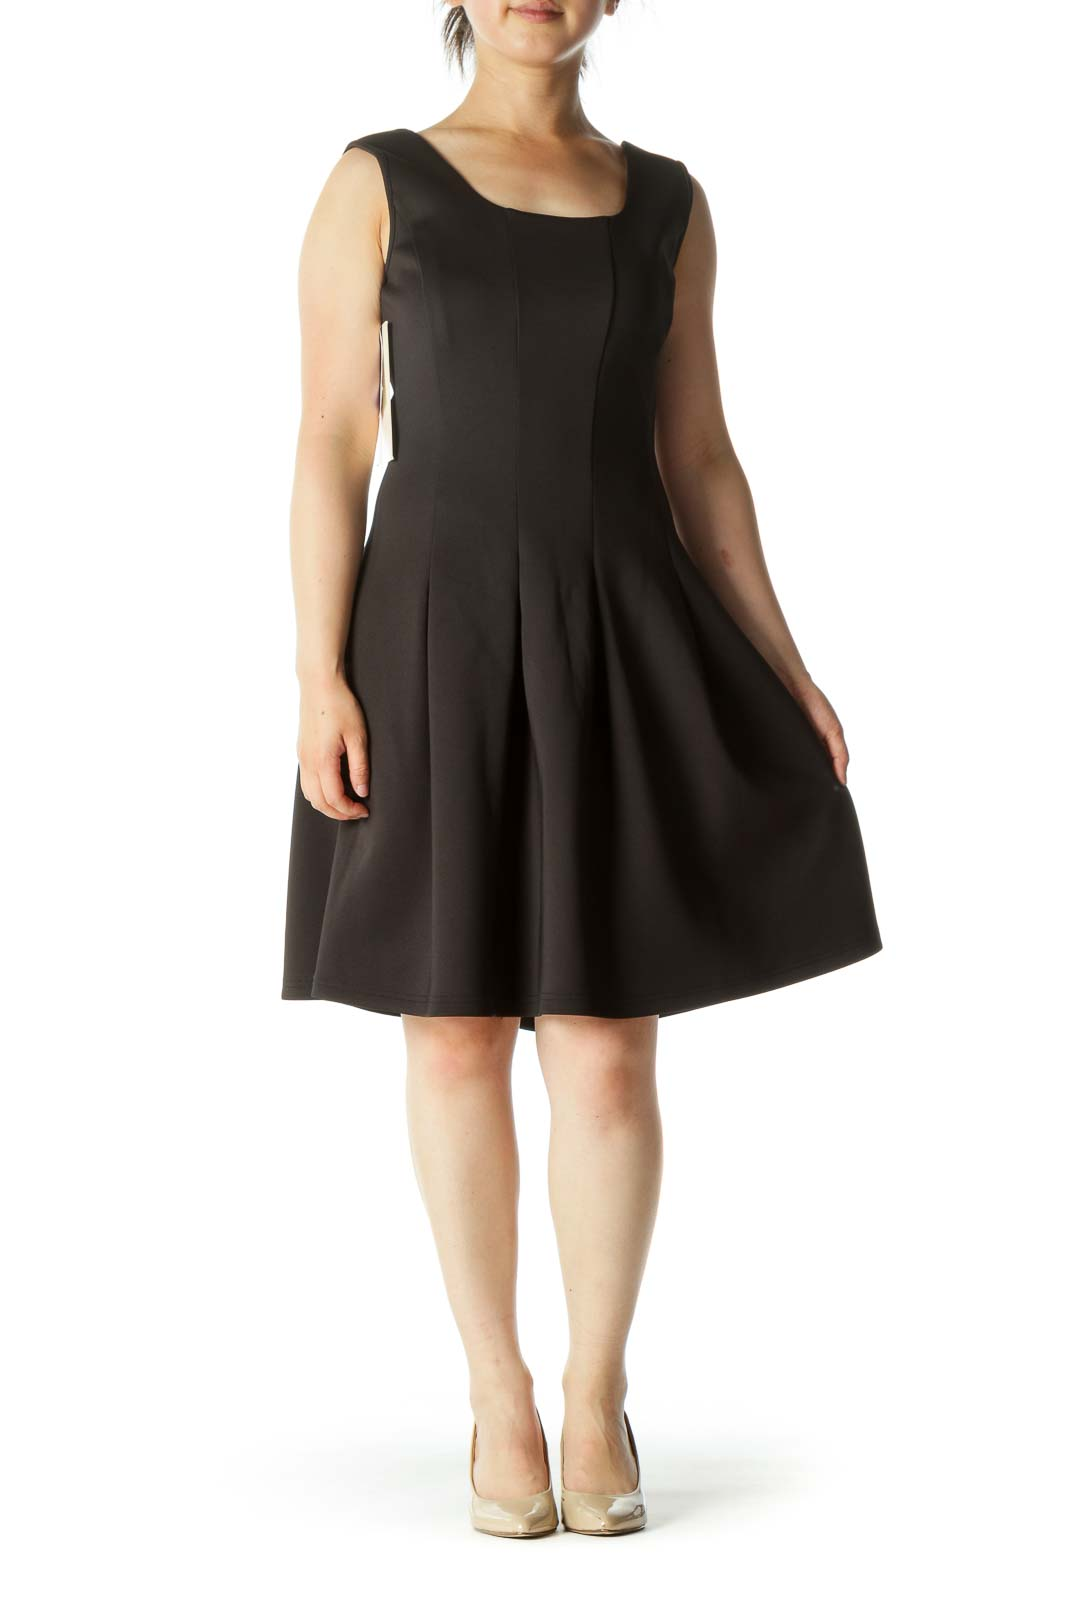 Black A-Line Pleated Work Dress